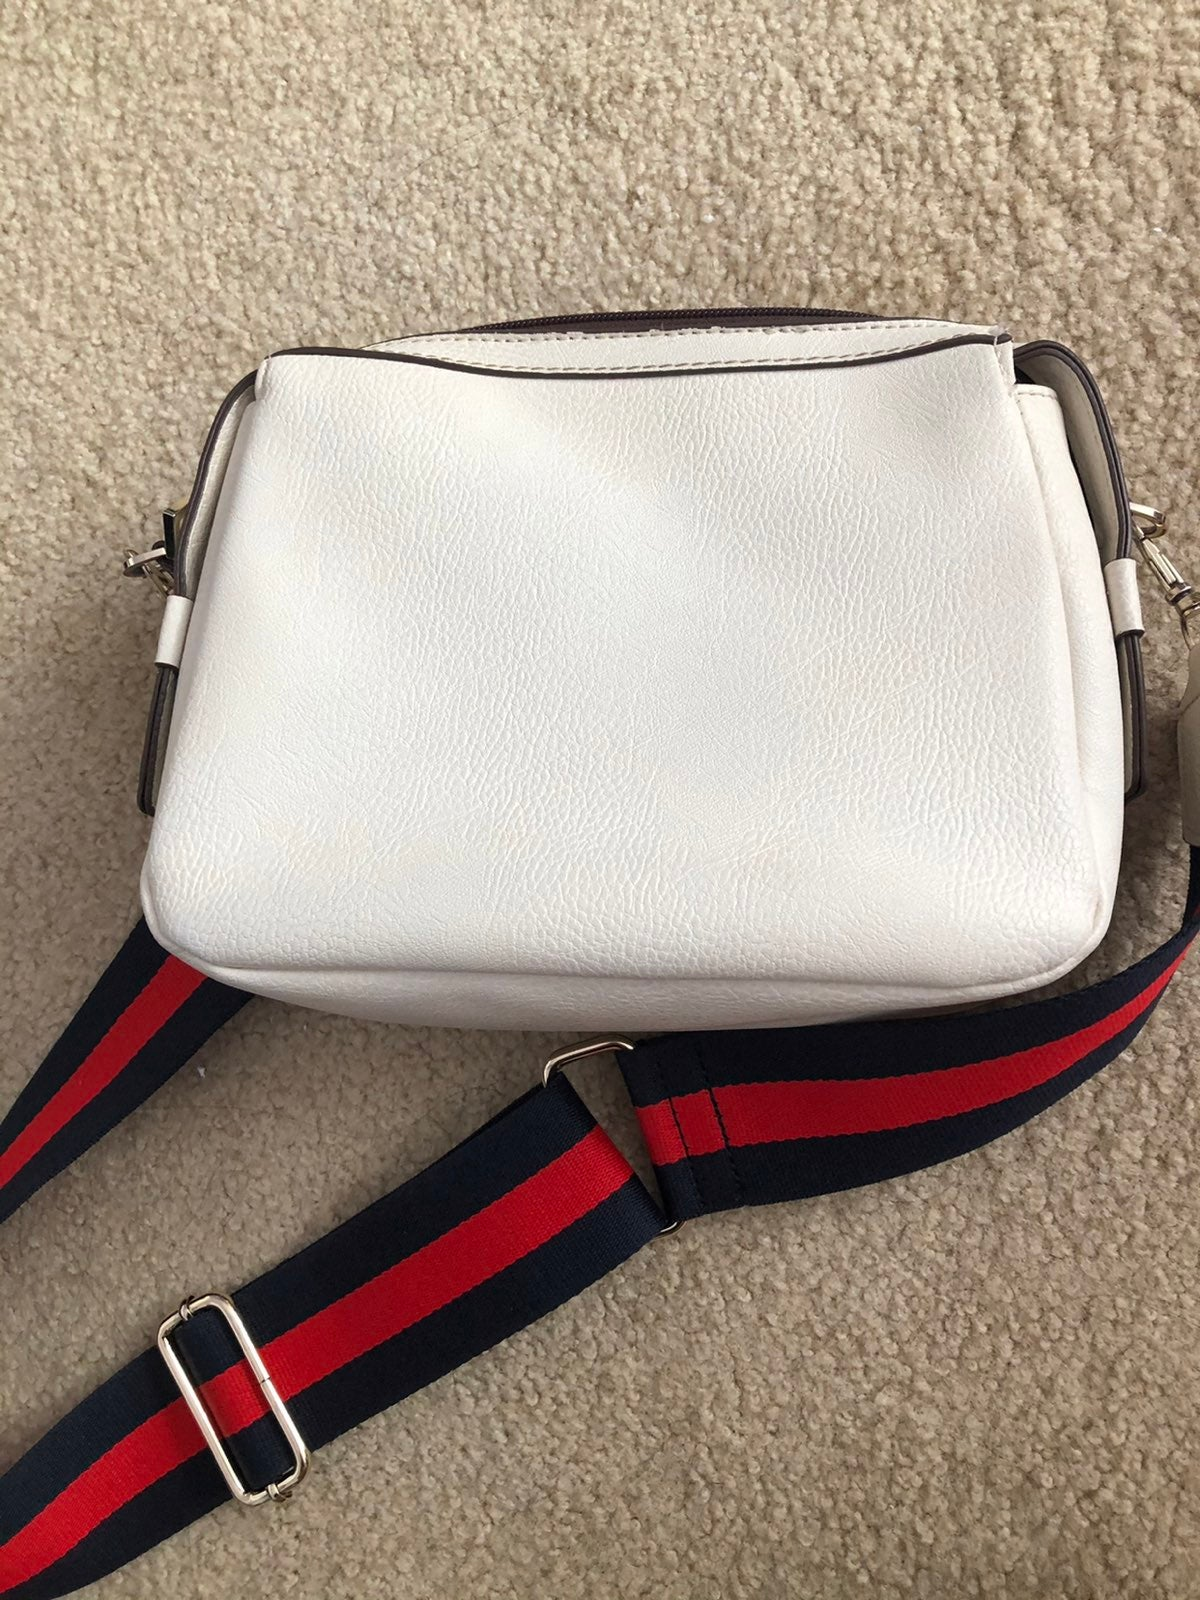 Crossbody thick strap handbag purse